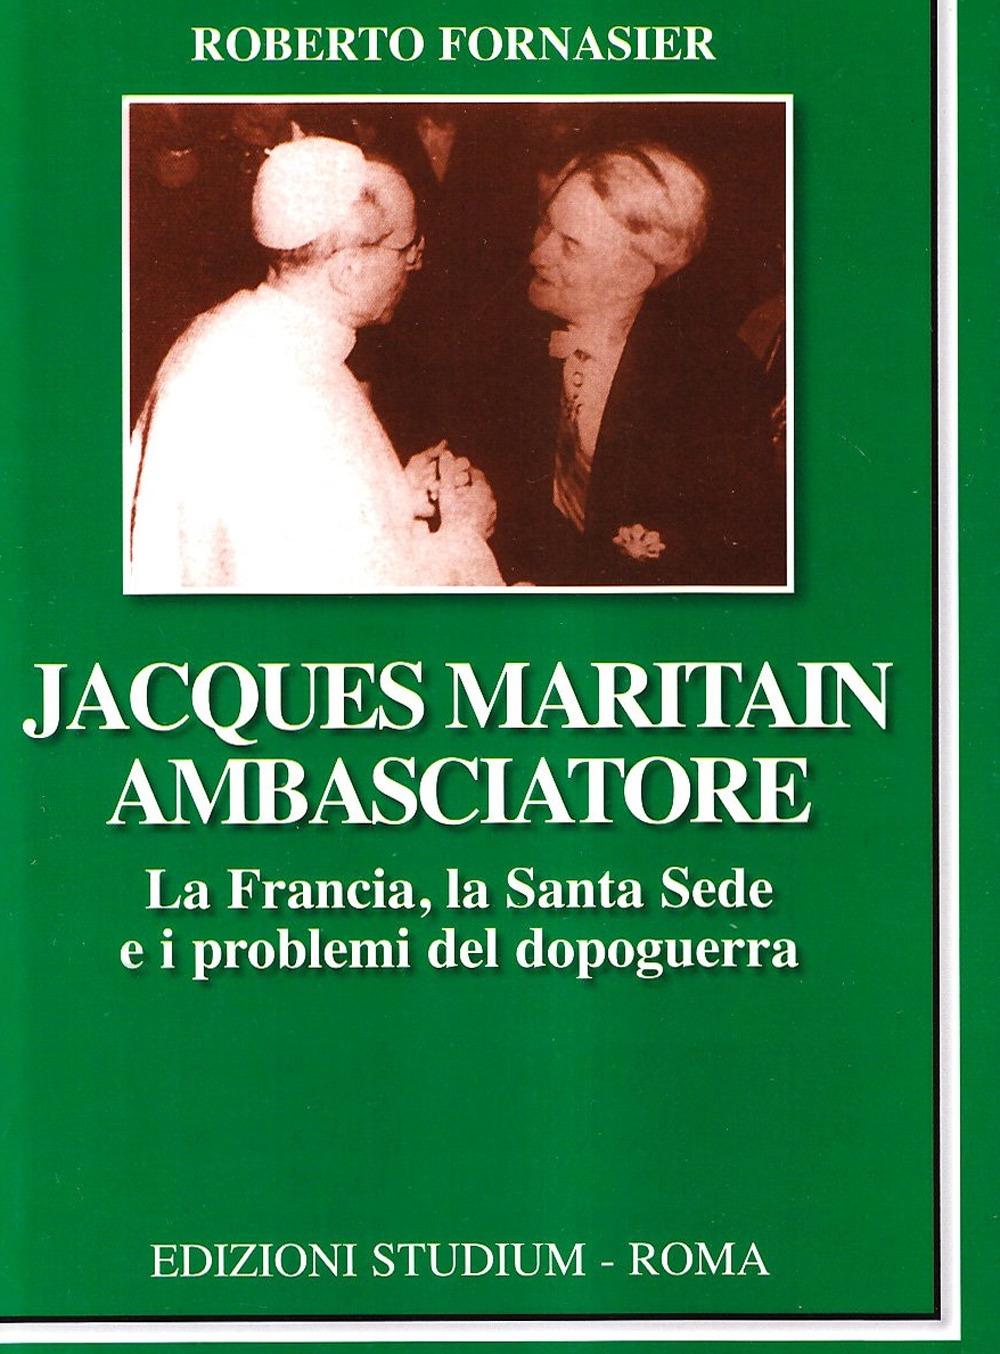 Jacques Maritain ambasciatore. La Francia, la Santa Sede e i problemi del dopoguerra